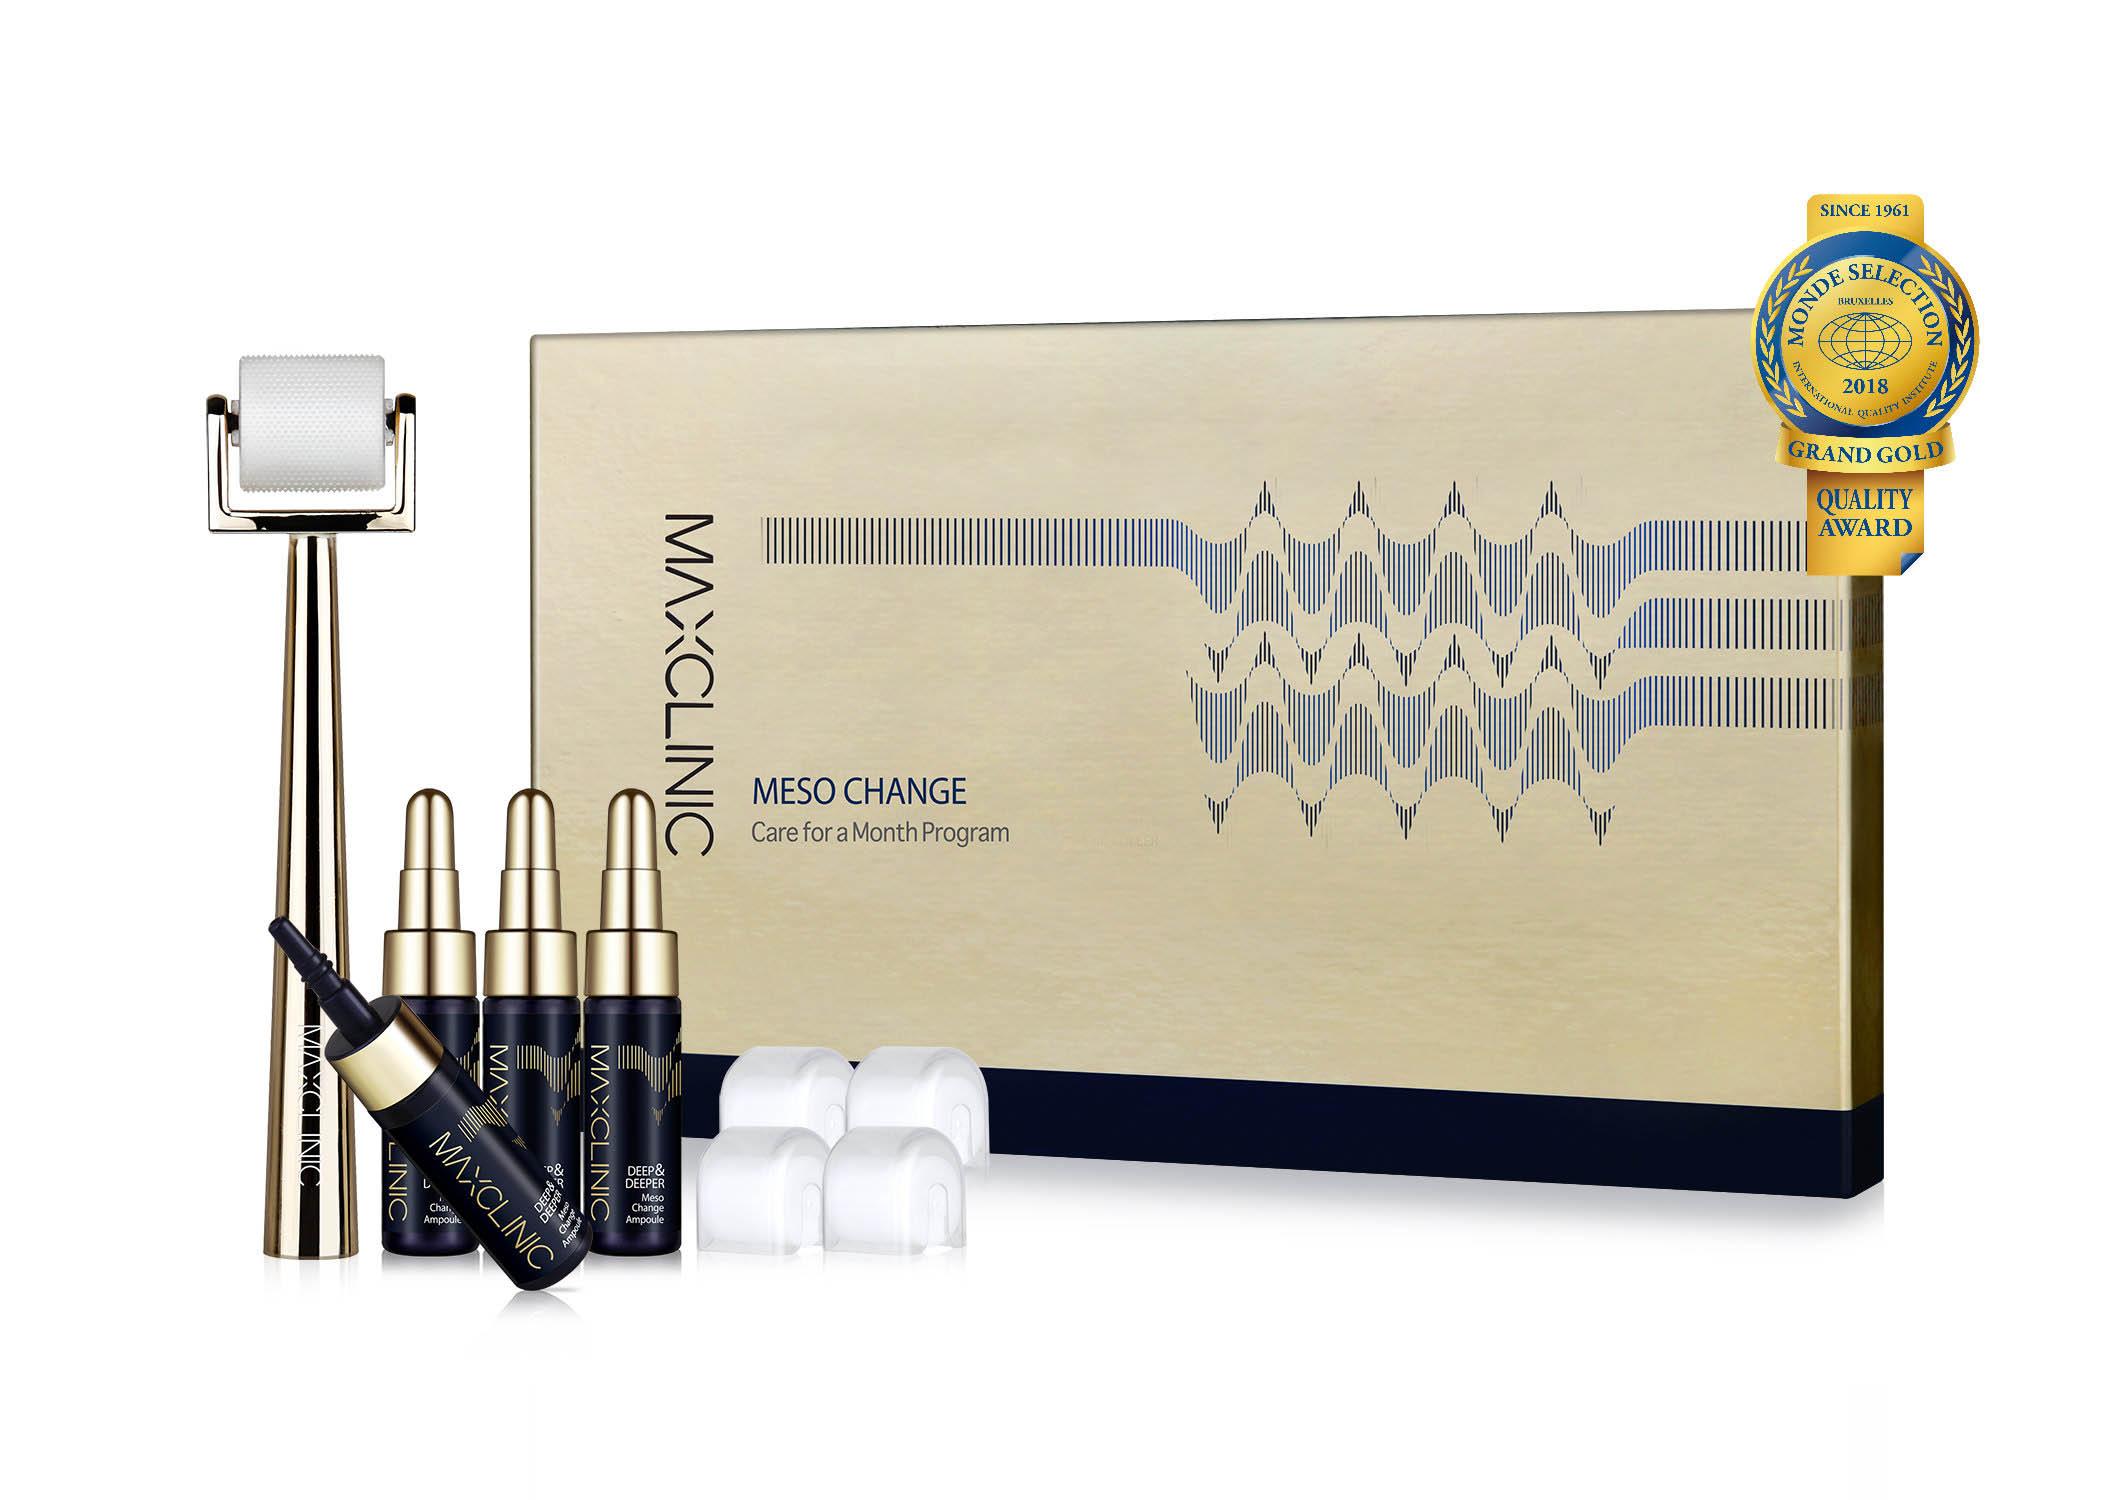 Maxclinic水光微針煥膚精華(套) ✅膠原蛋白精華安瓶7ml x 4瓶/可溶型玻尿酸微針•滾輪4入/微針•滾輪手柄 1支